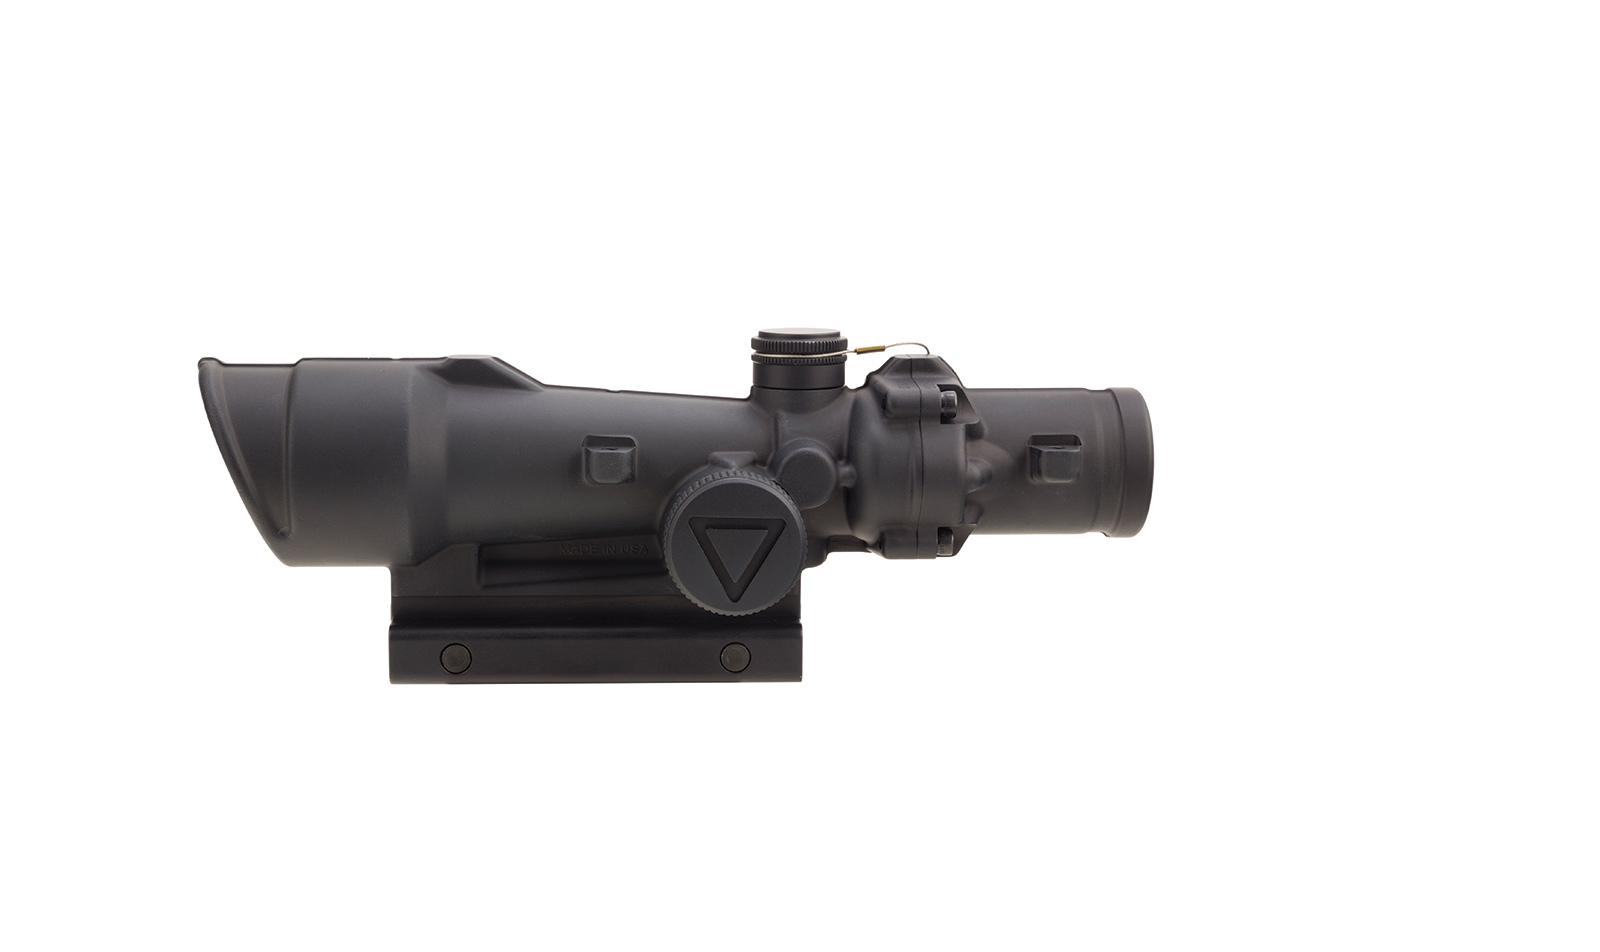 TA110-D-100502 angle 2